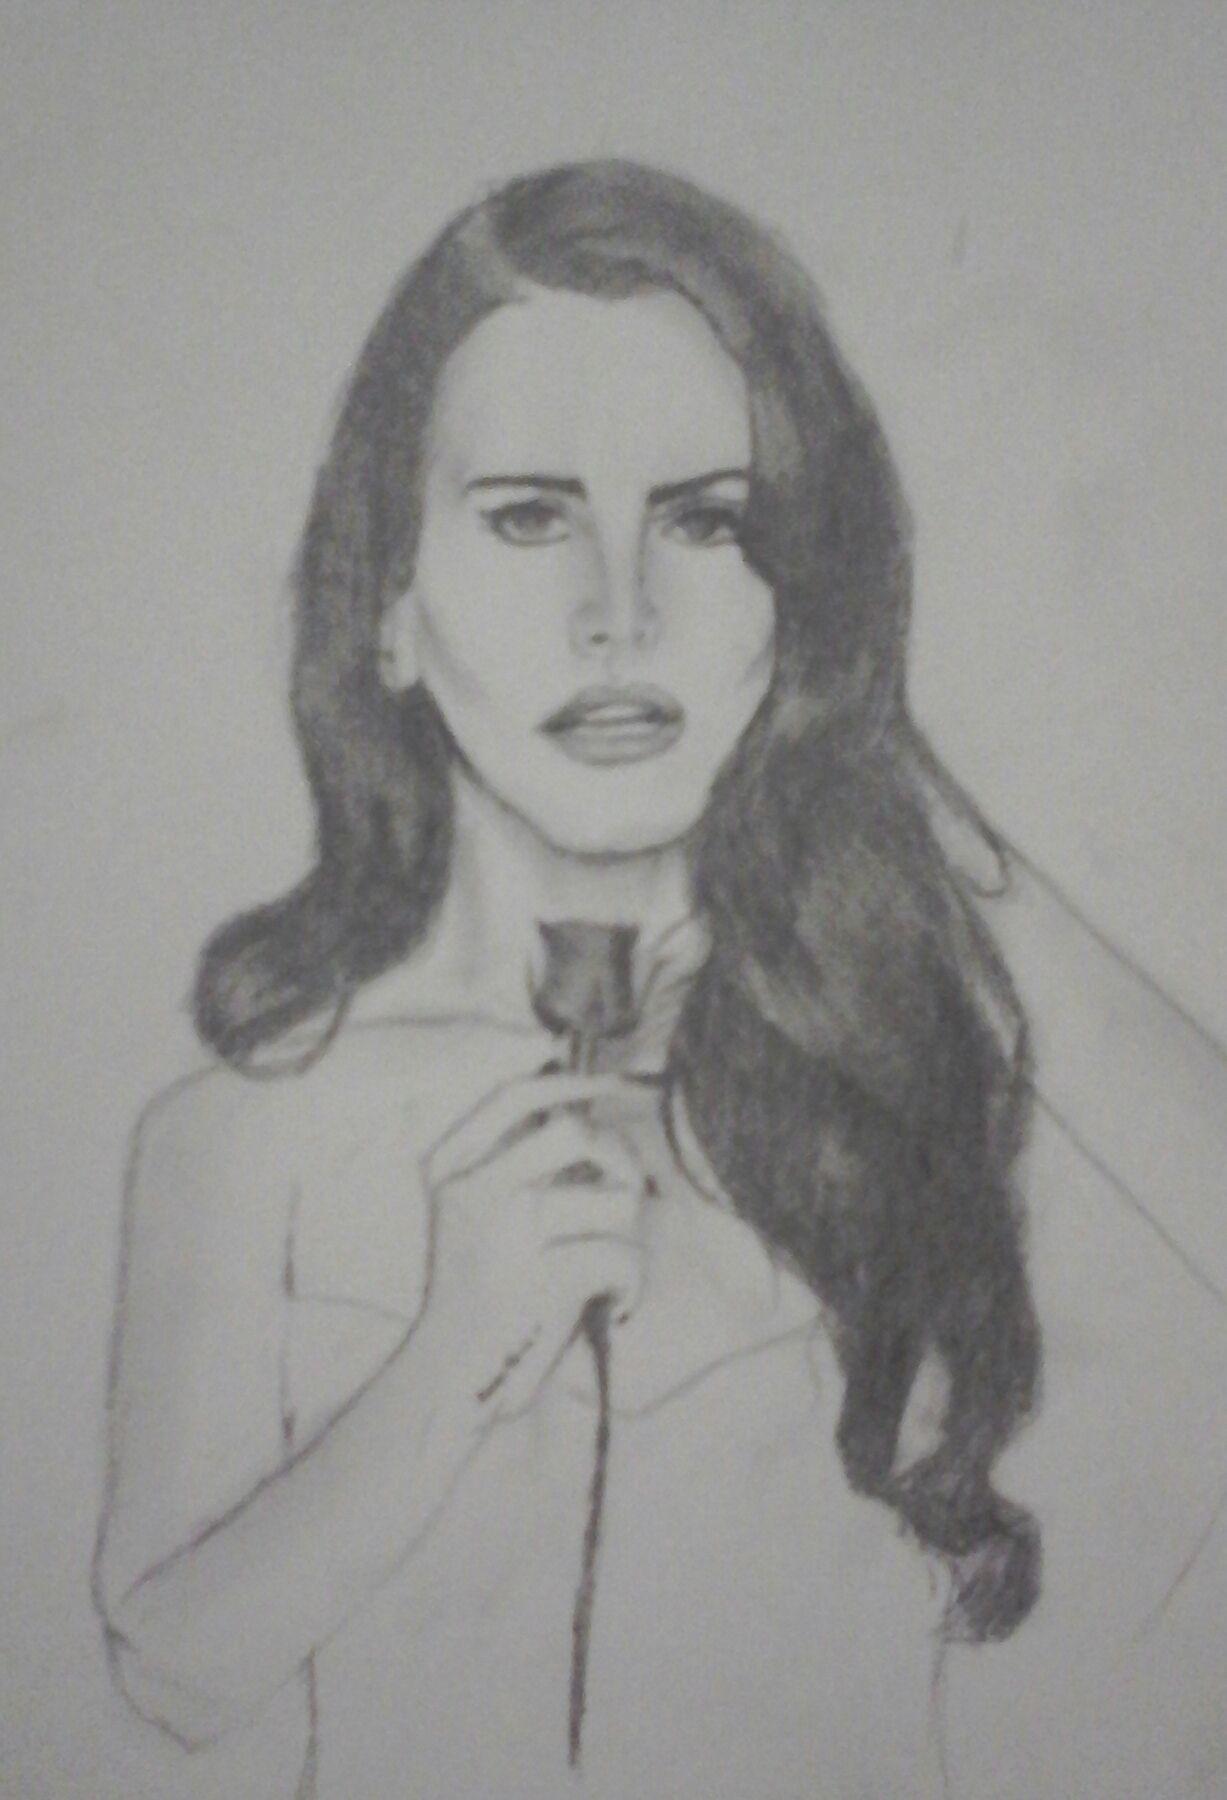 Gambar wajah menggunakan pensil Draw on photos, Drawings